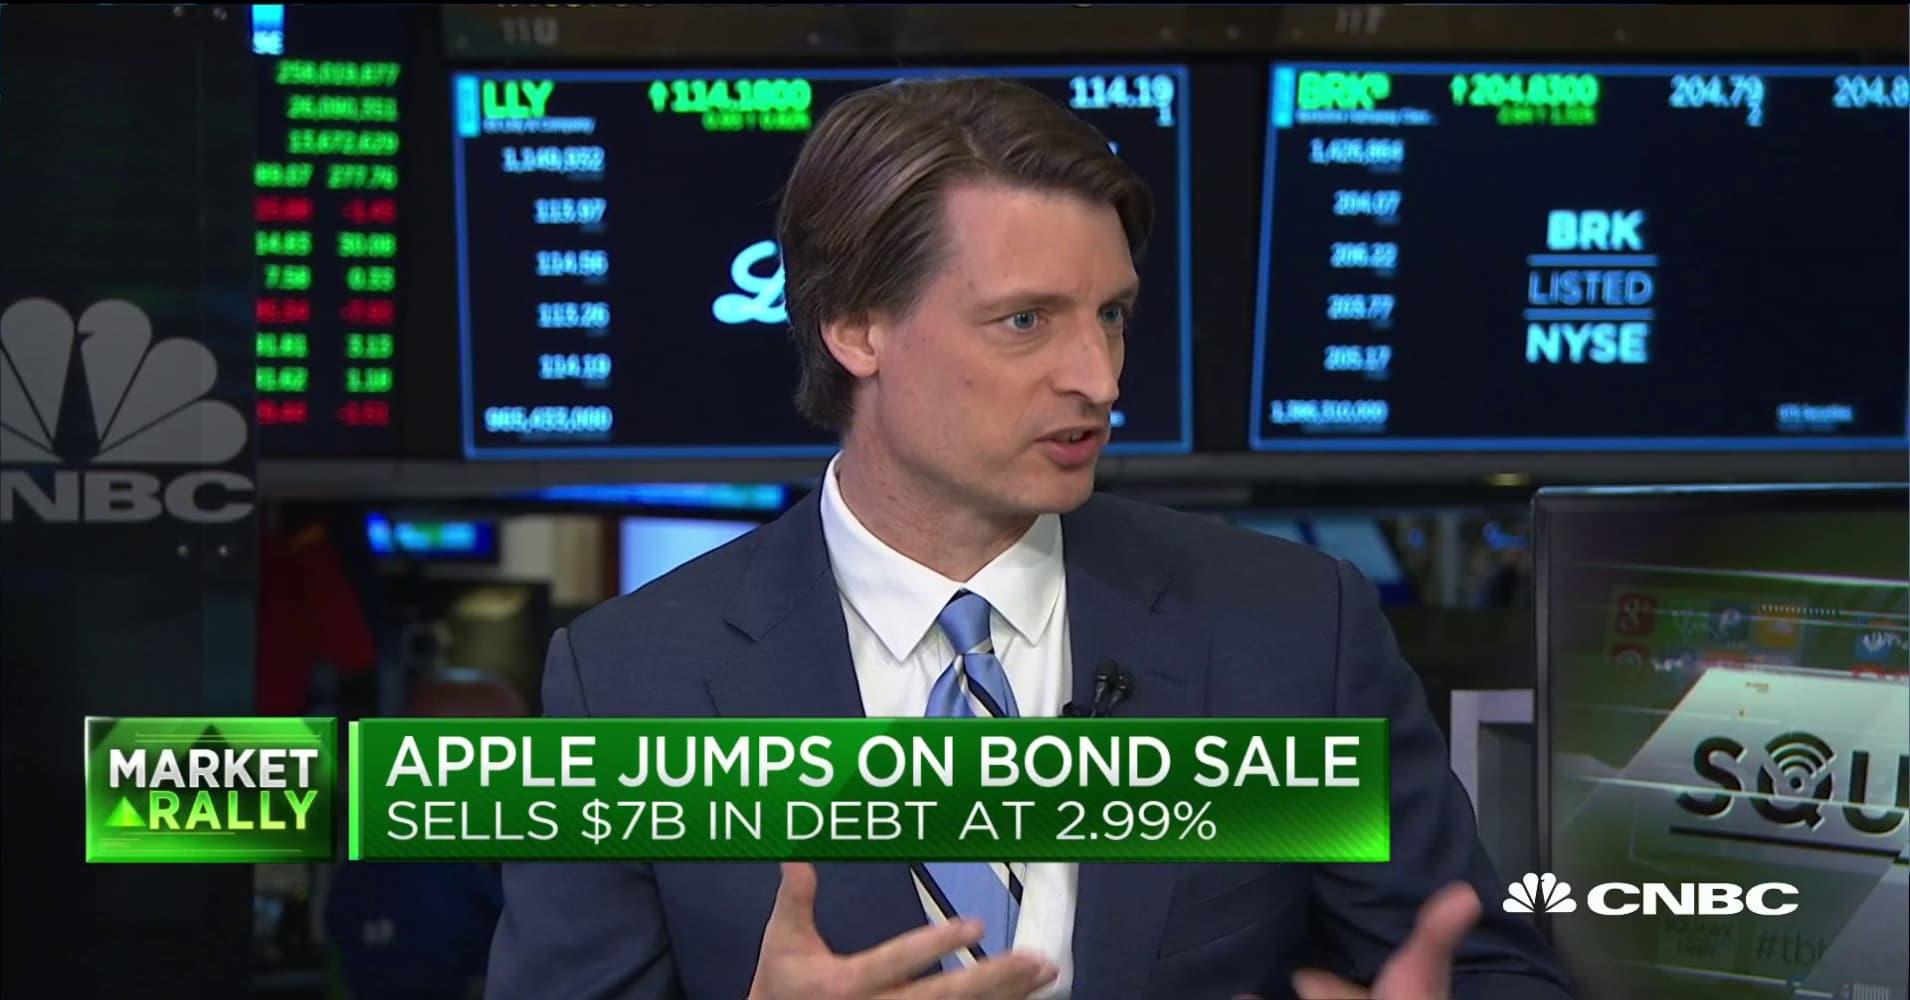 Mundane iPhone refresh priced into Apple's stock, says Nomura analyst